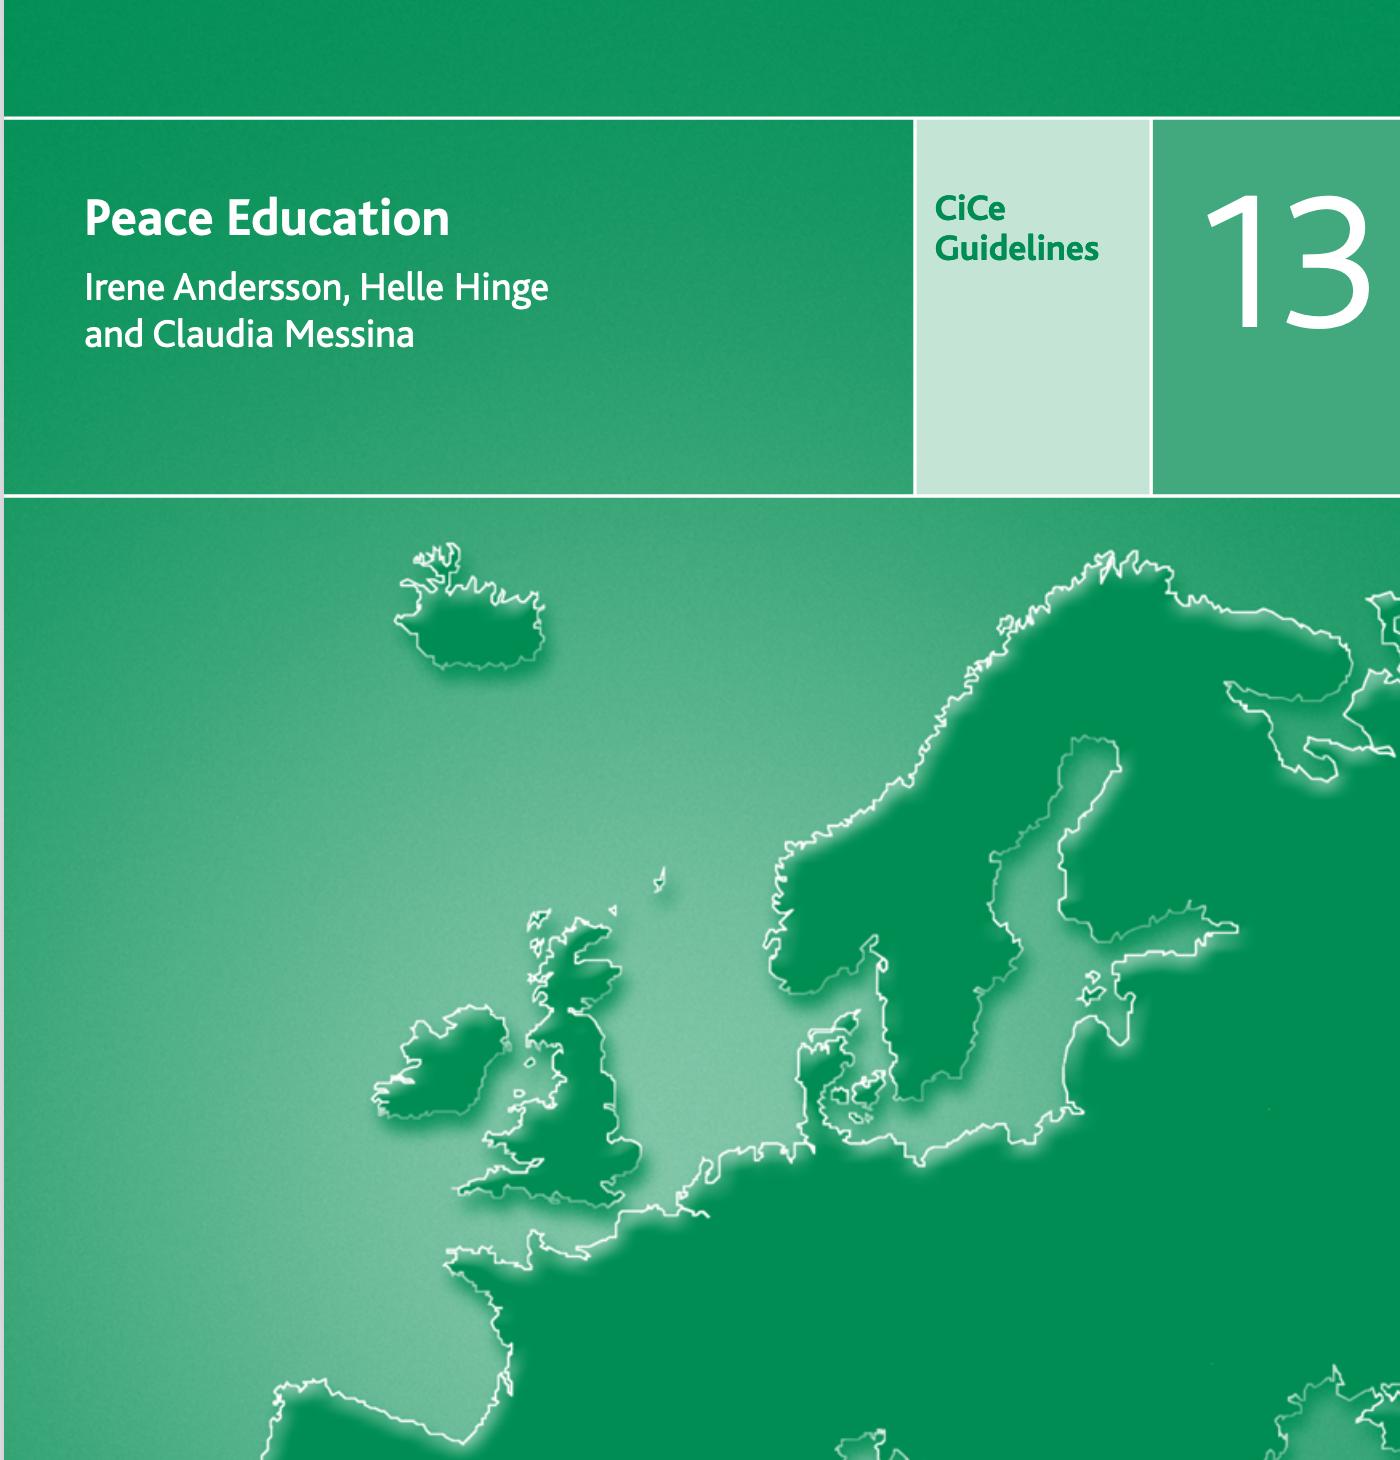 Fredsundervisning